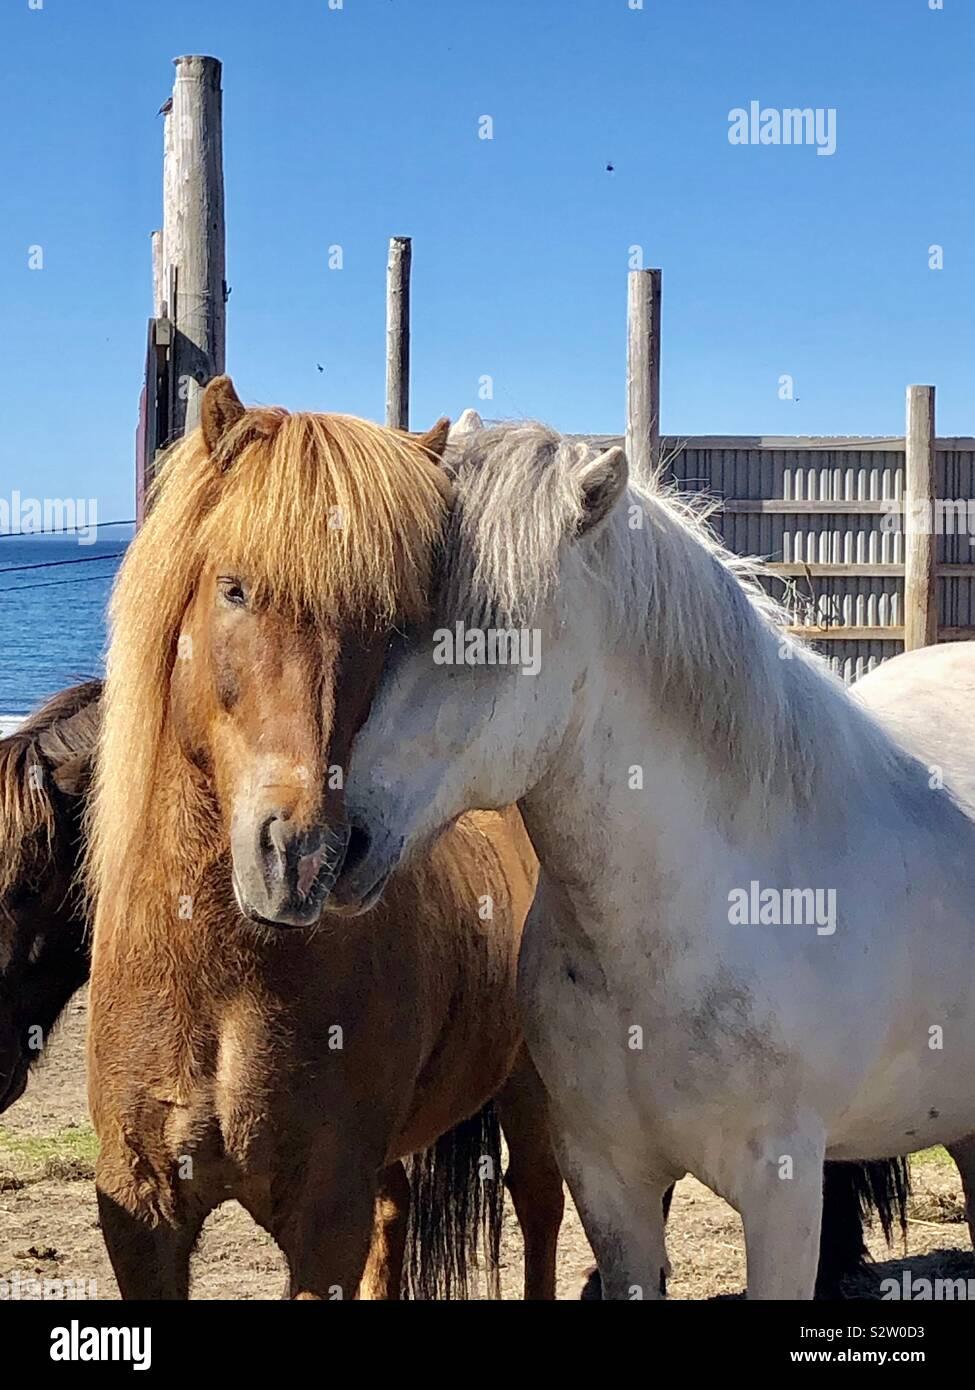 Cavallini islandesi, Hov, Isole Lofoten in Norvegia Foto Stock